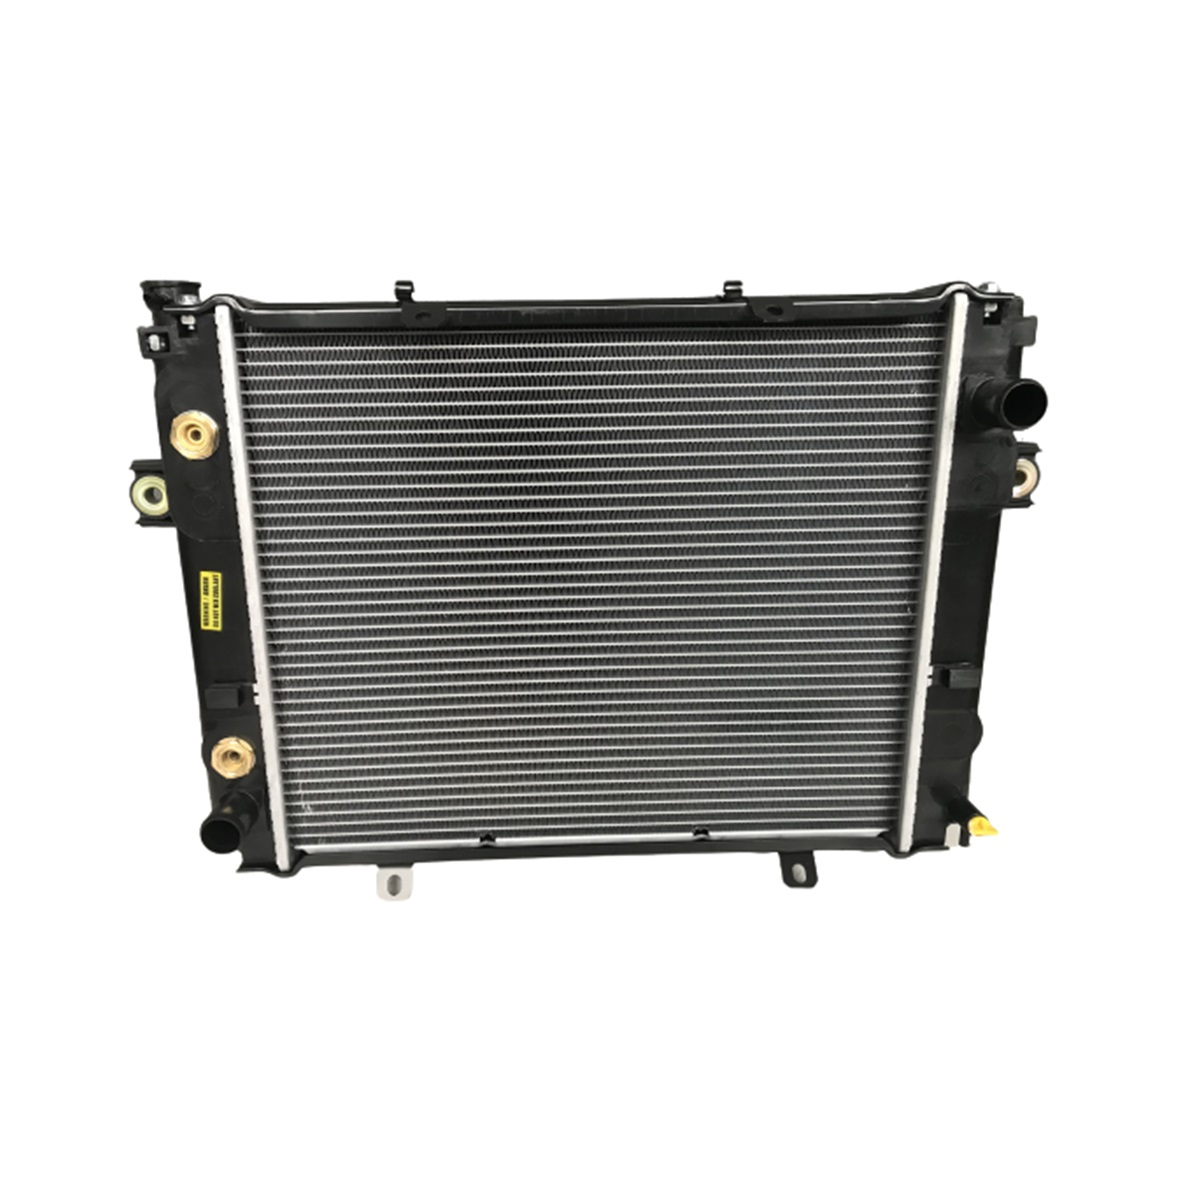 Radiador Empilhadeira Toyota / Hyster / Nissan